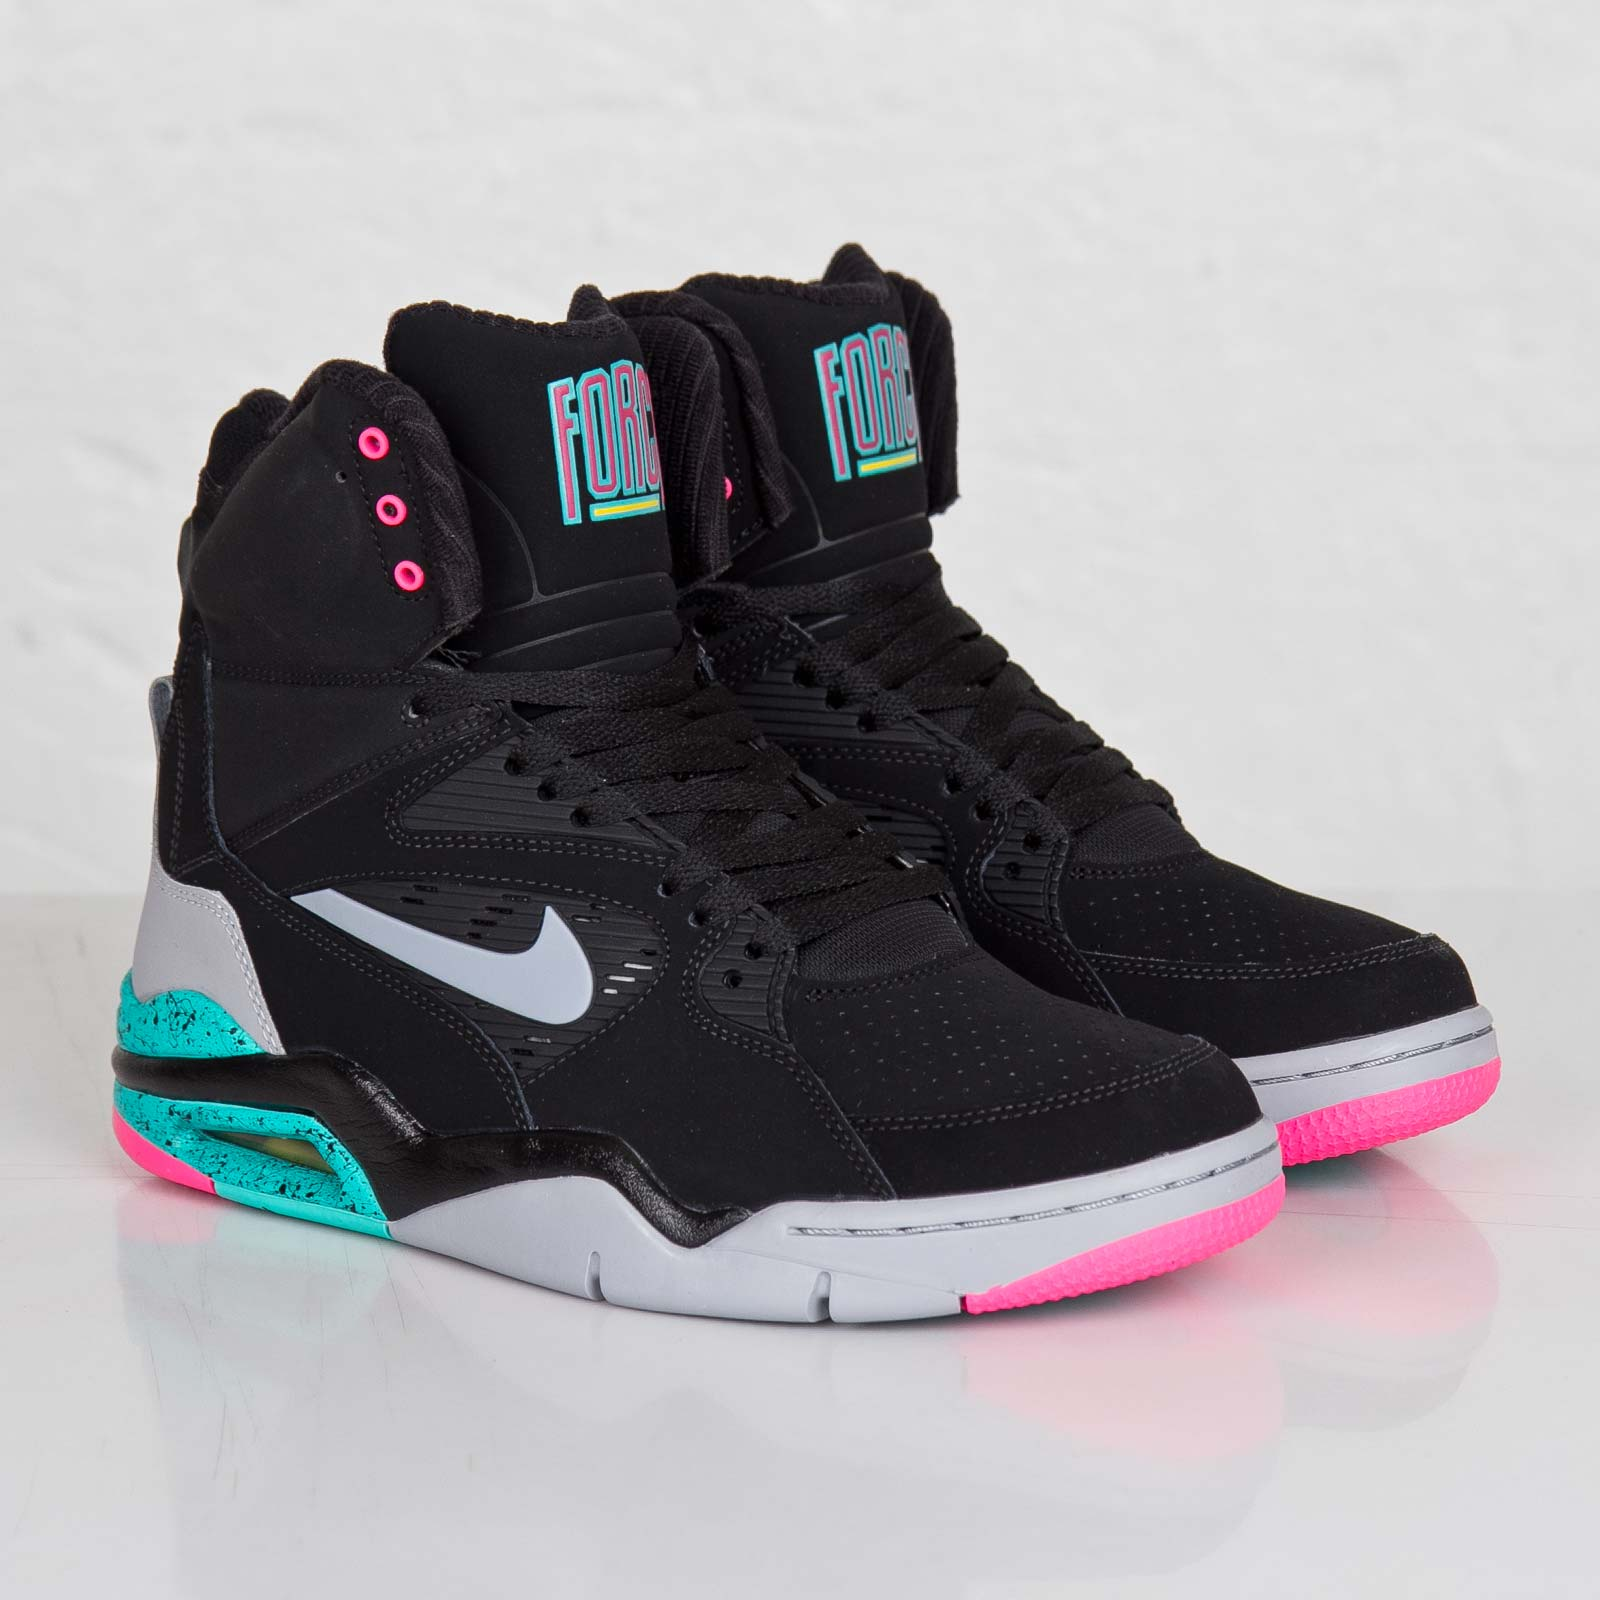 2e6bb4ac1c8 Nike Nike Air Command Force - 684715-001 - Sneakersnstuff